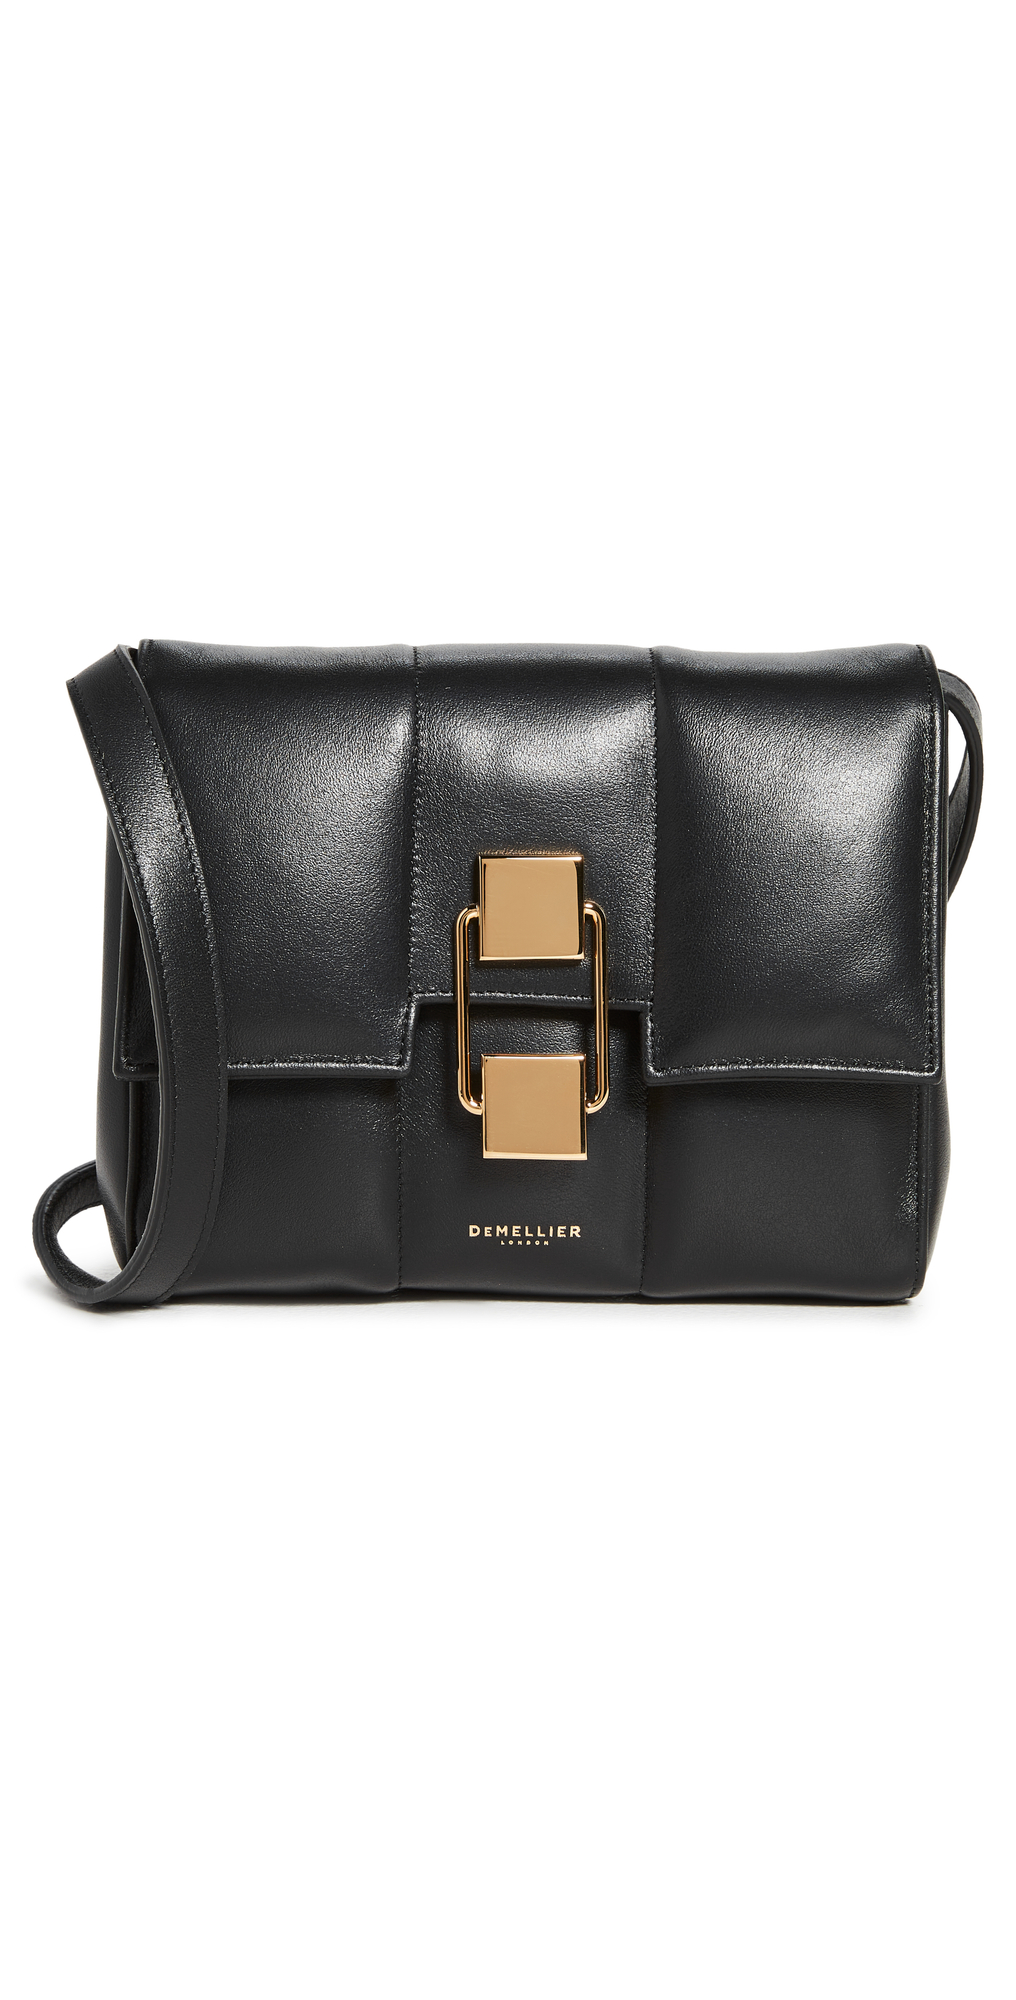 DeMellier Mini Alexandria Bag